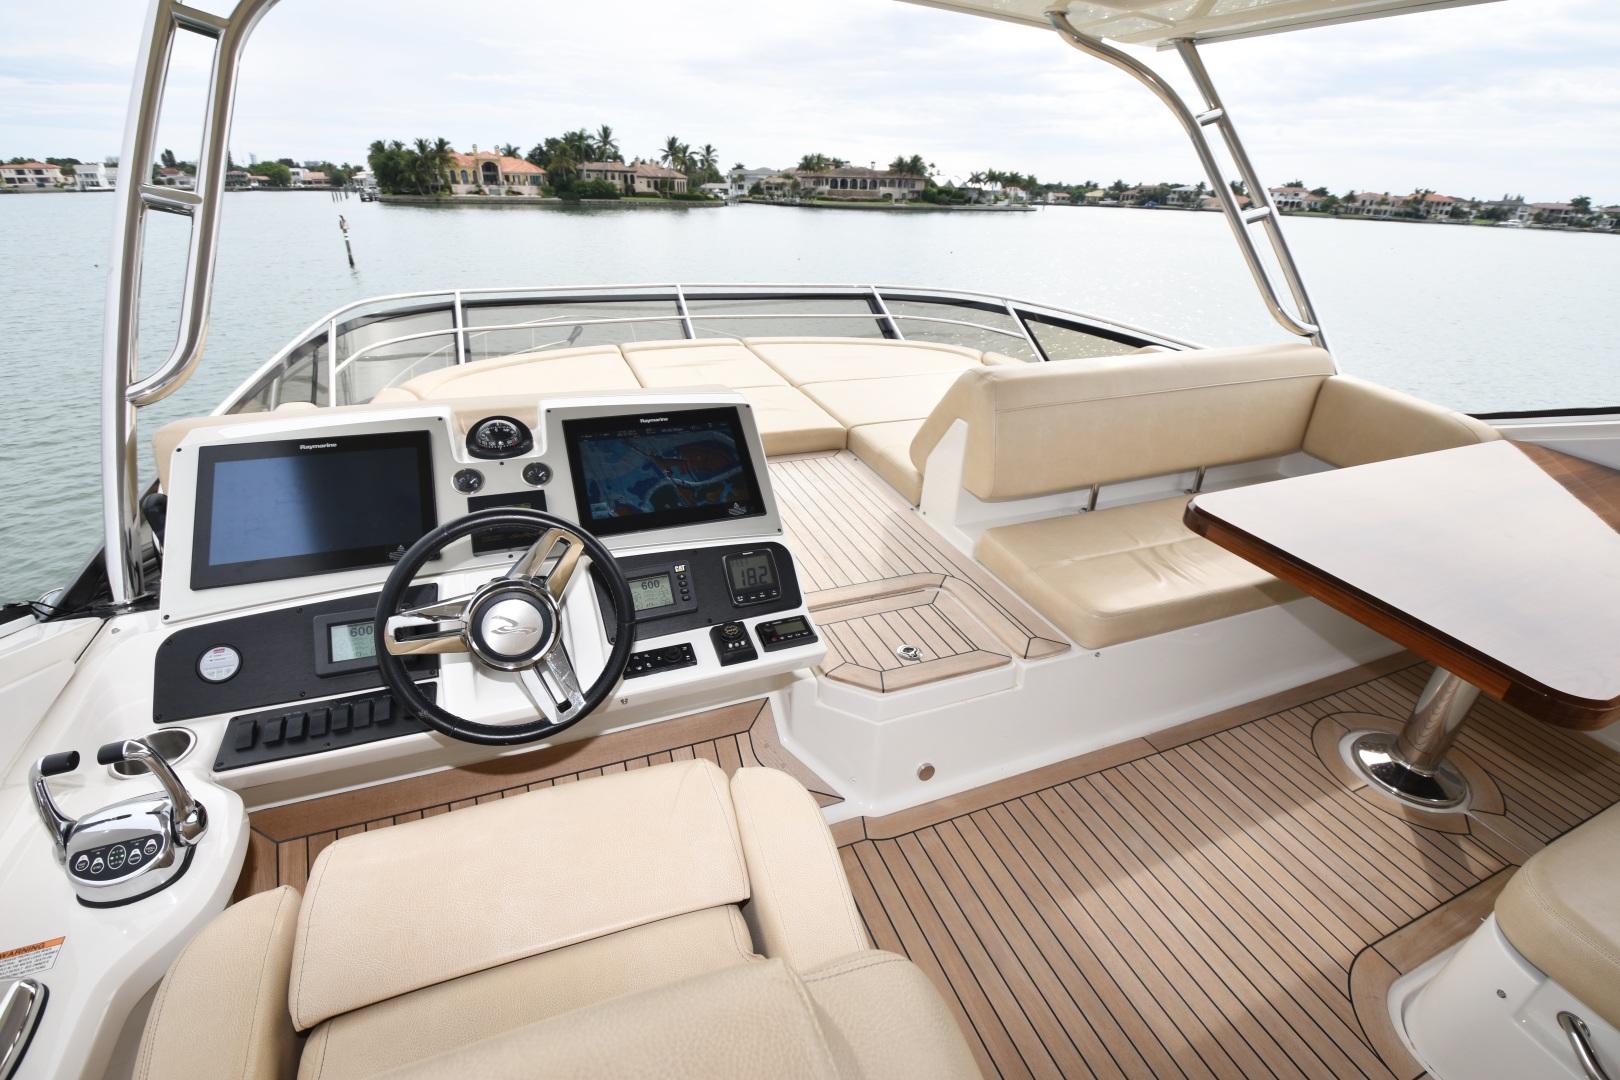 Sea Ray-L650 2016-3x's the Charm Longboat Key-Florida-United States-2016 Sea Ray L650  3x's the Charm  Flybridge Helm-1251850 | Thumbnail